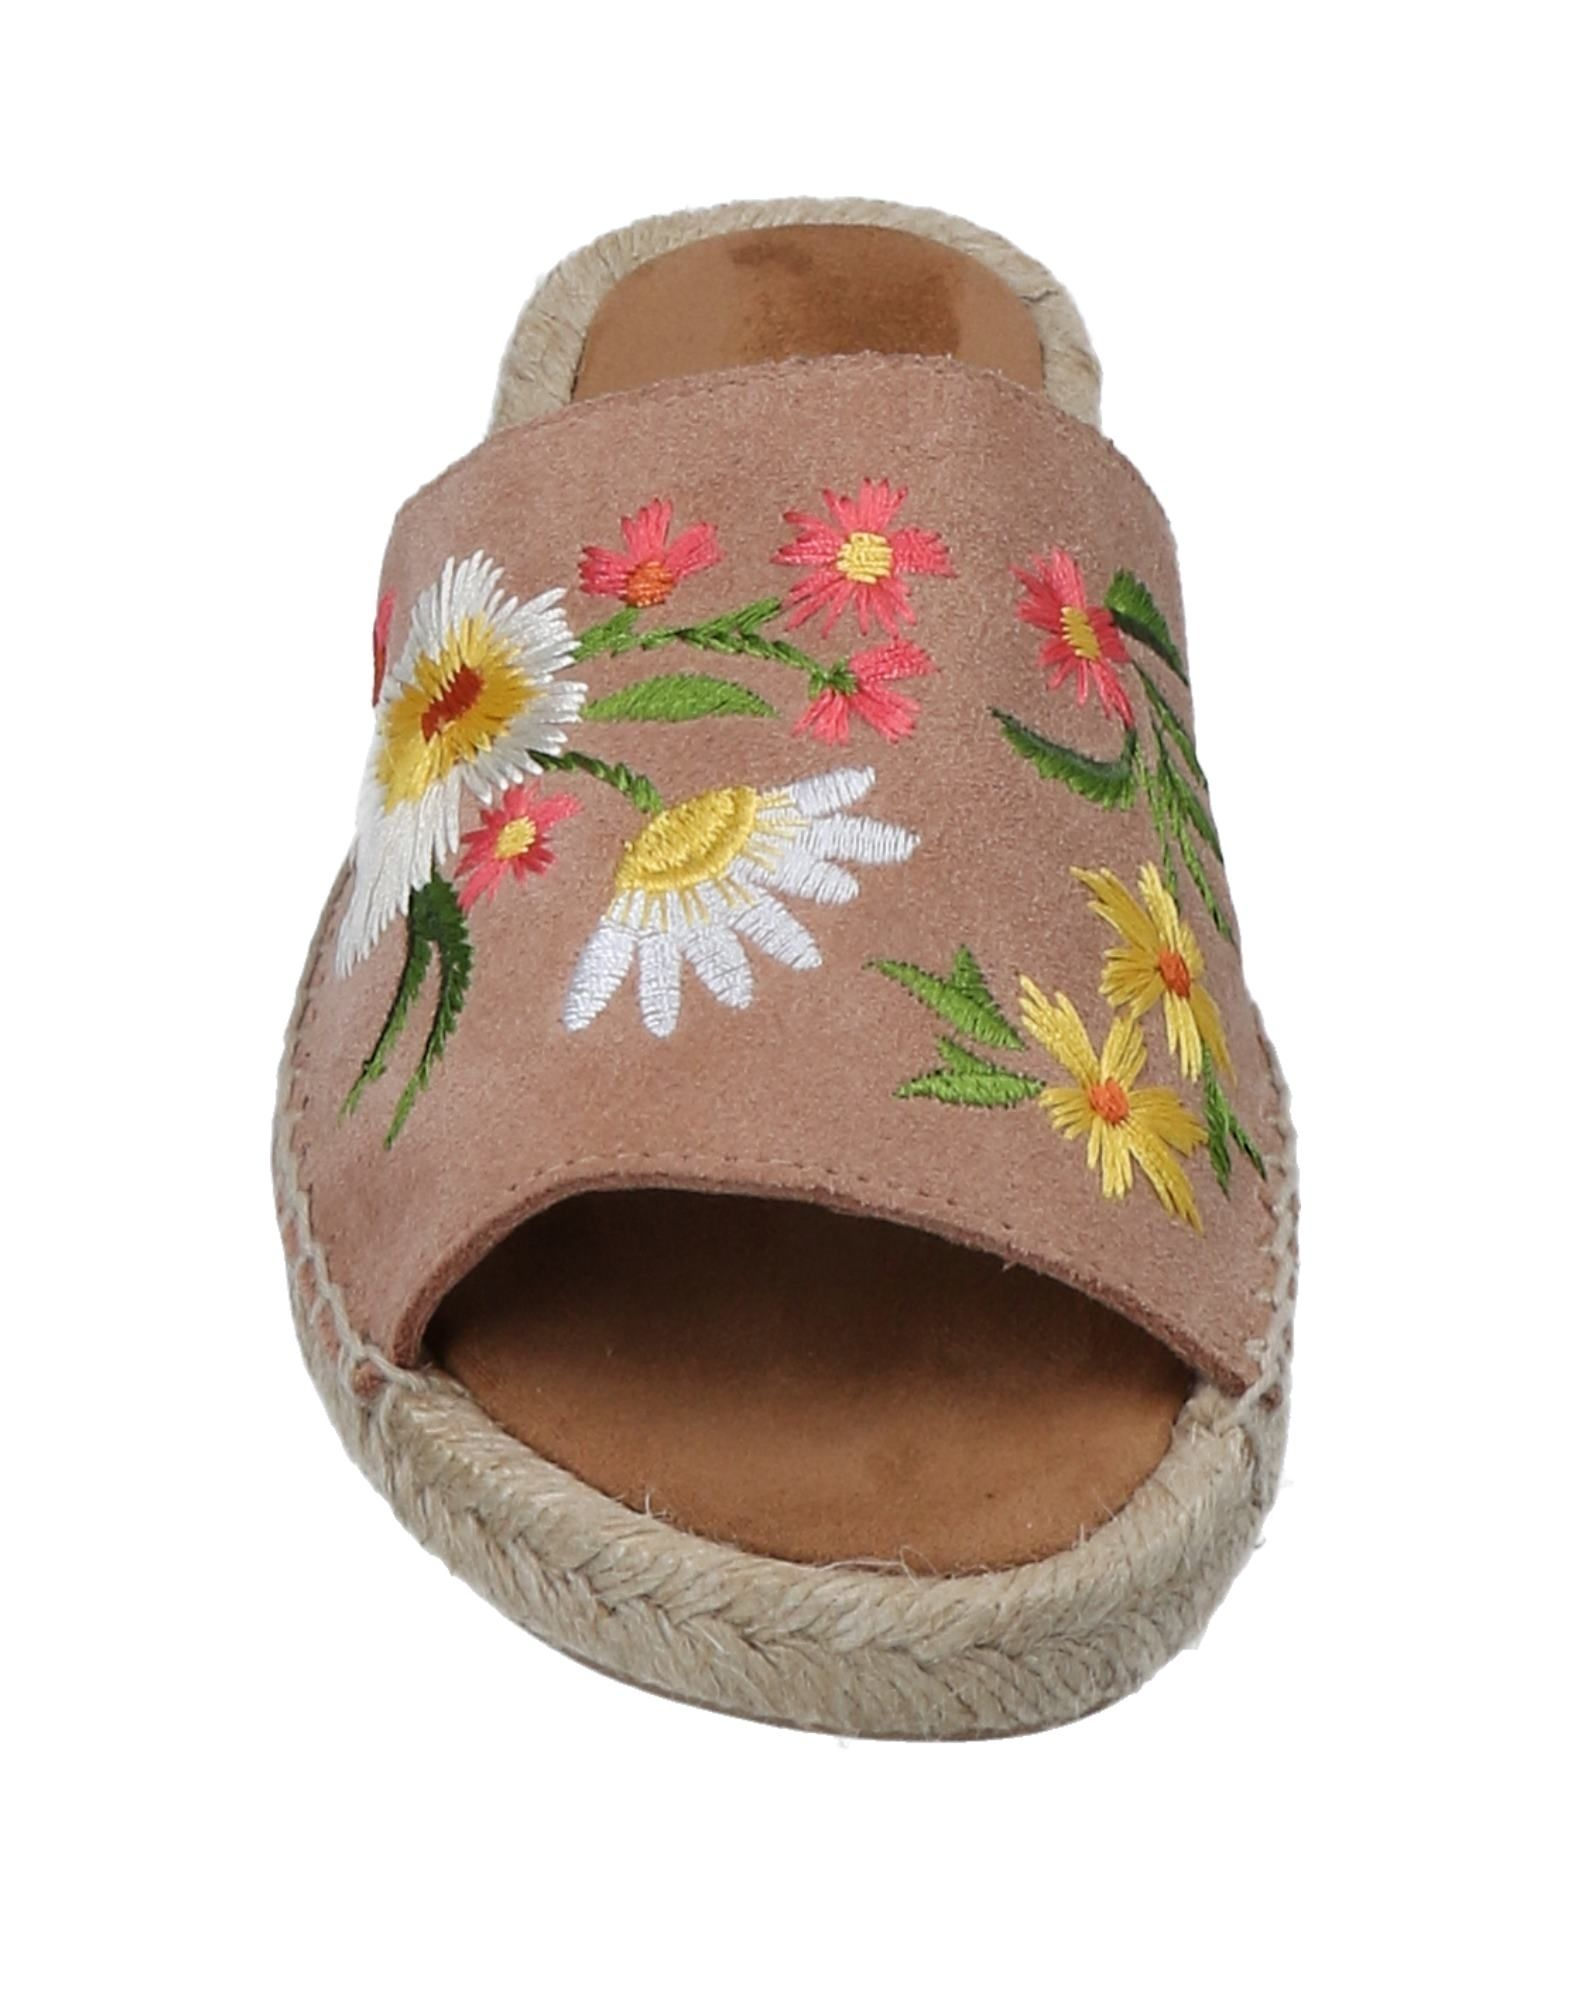 M&P Maypol Gute Sandalen Damen  11552277RT Gute Maypol Qualität beliebte Schuhe dbcbd7